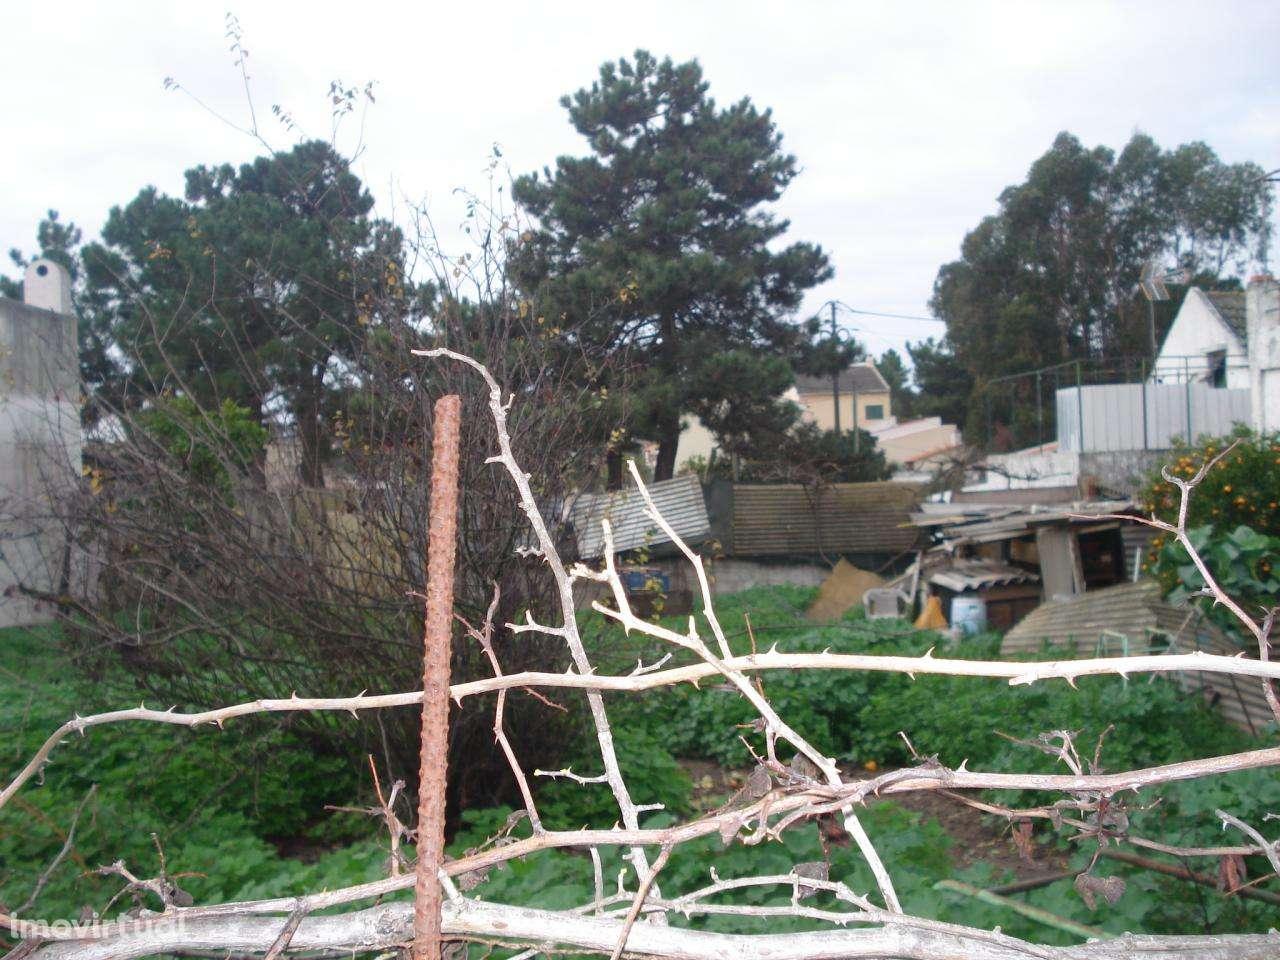 Terreno para comprar, Quinta do Conde, Sesimbra, Setúbal - Foto 1